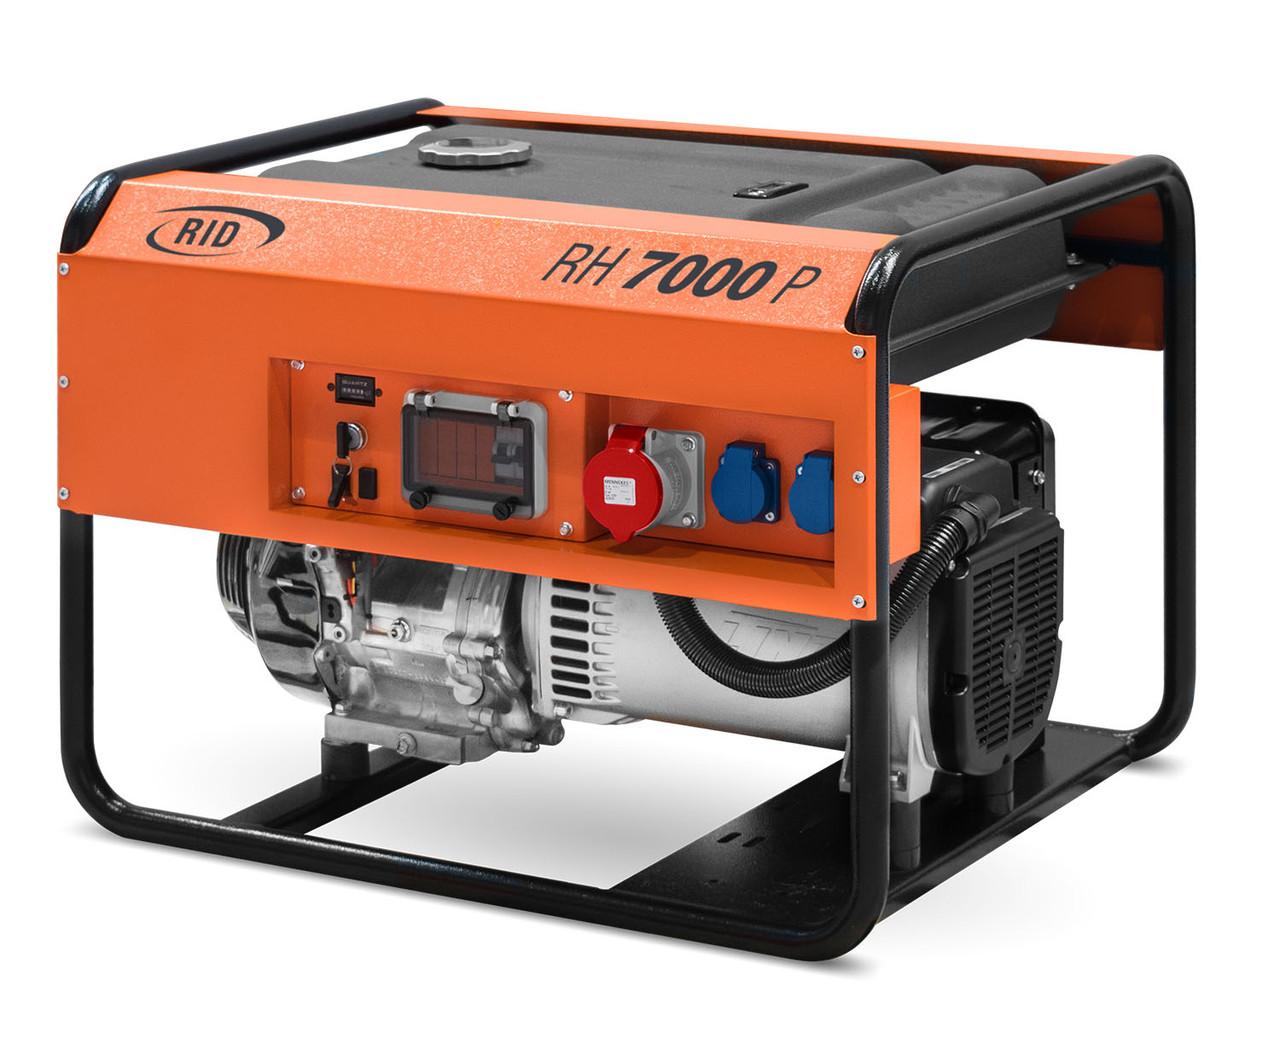 RID RH 7000 P (5,6 кВт)